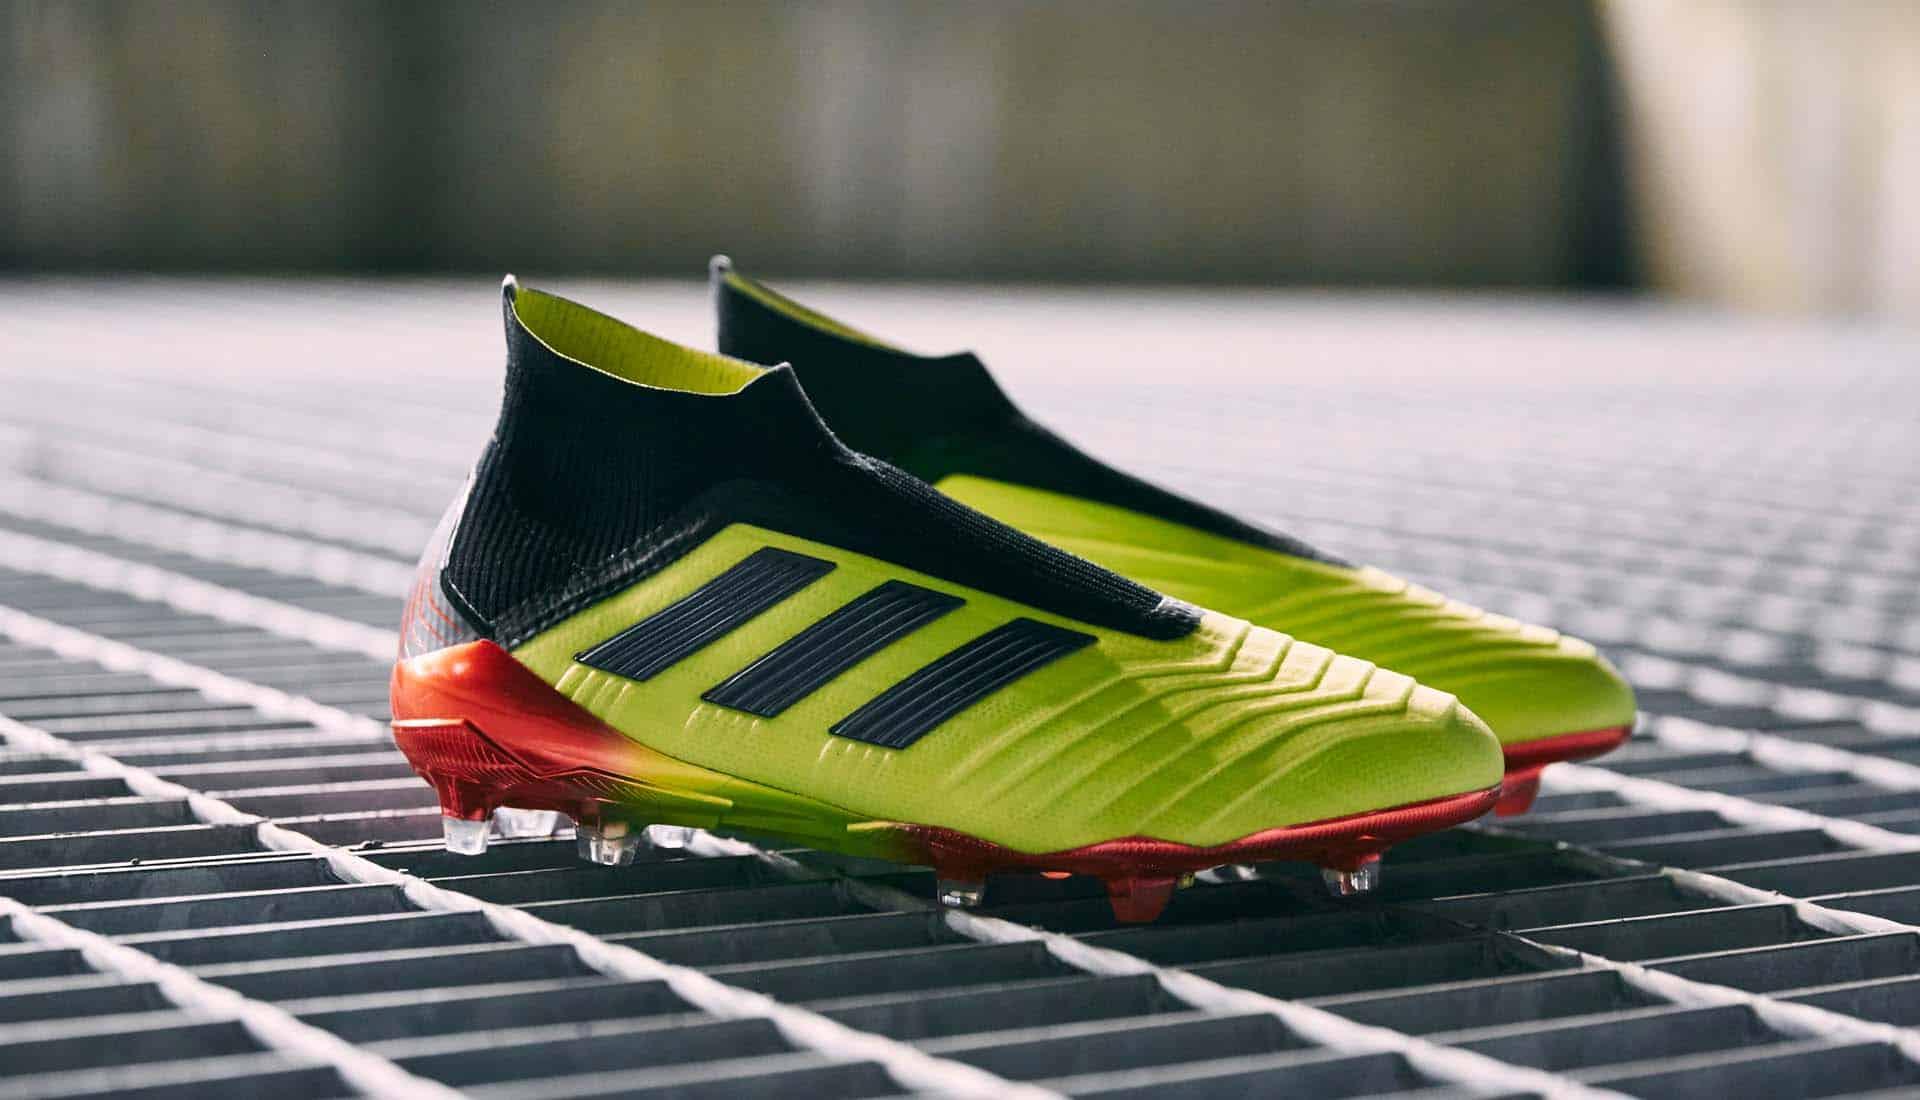 chaussures-adidas-Predator-18-energy-mode-img5